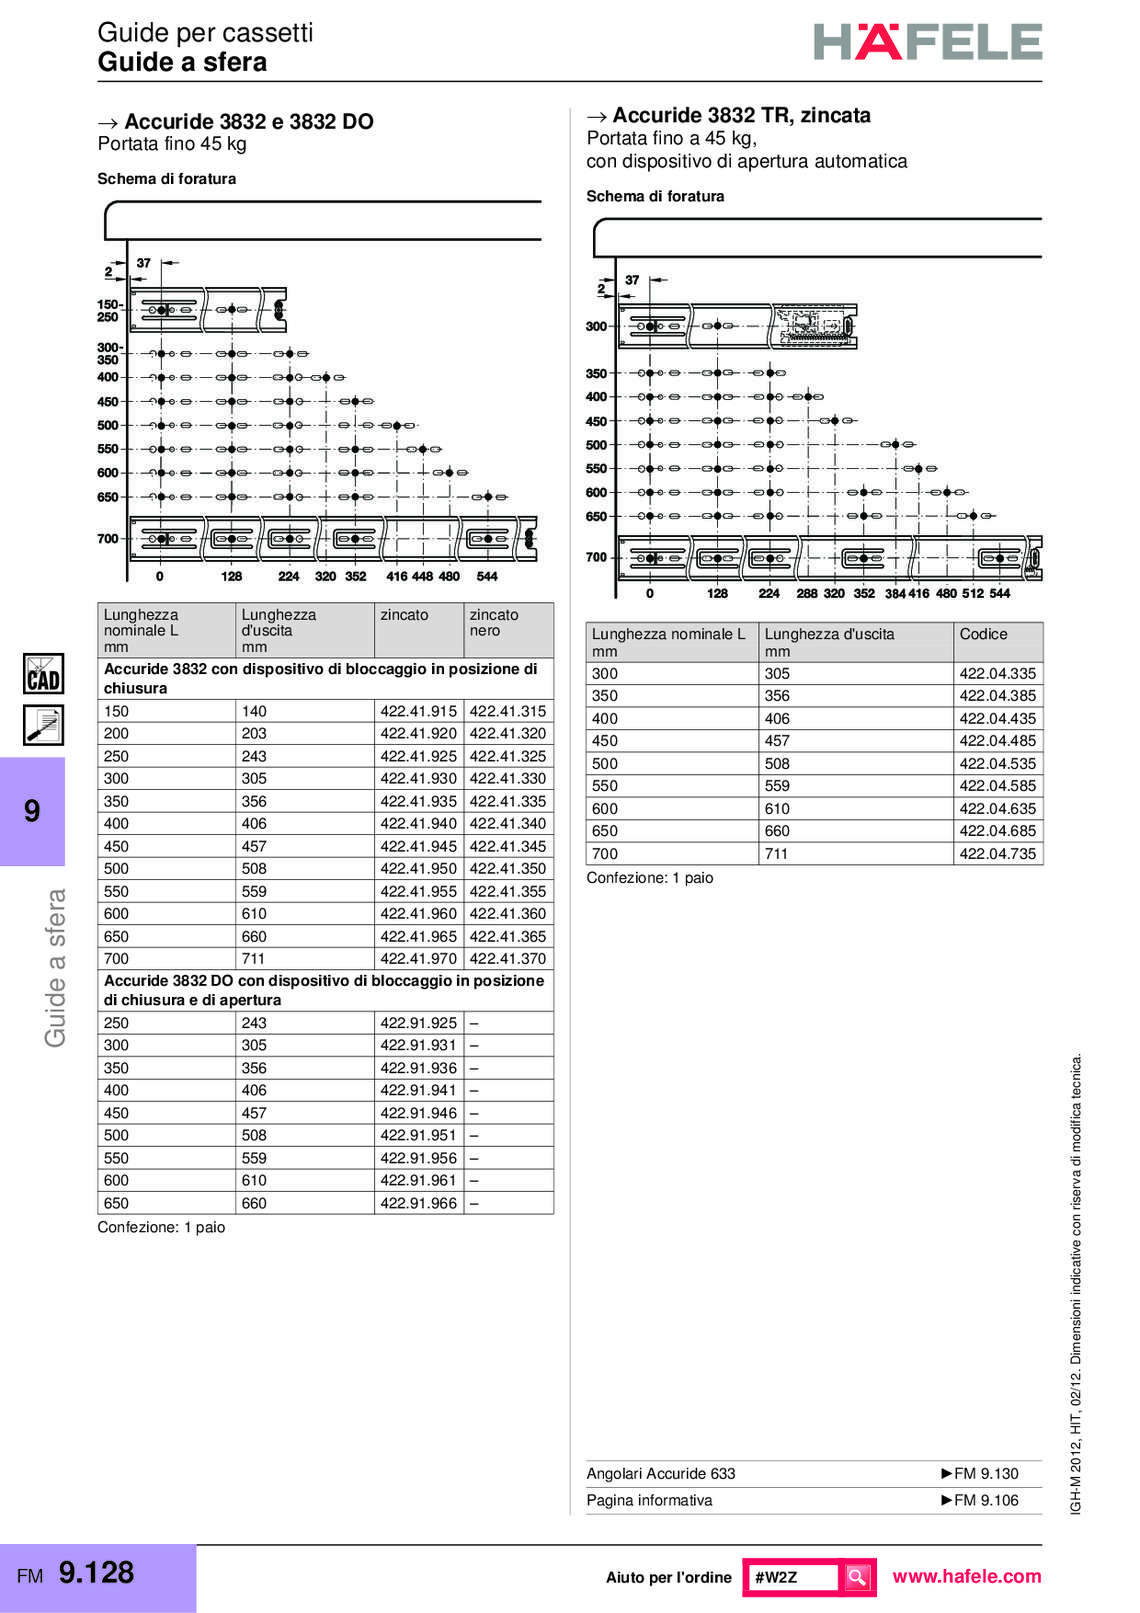 hafele-spondine-e-guide-per-mobili_40_181.jpg